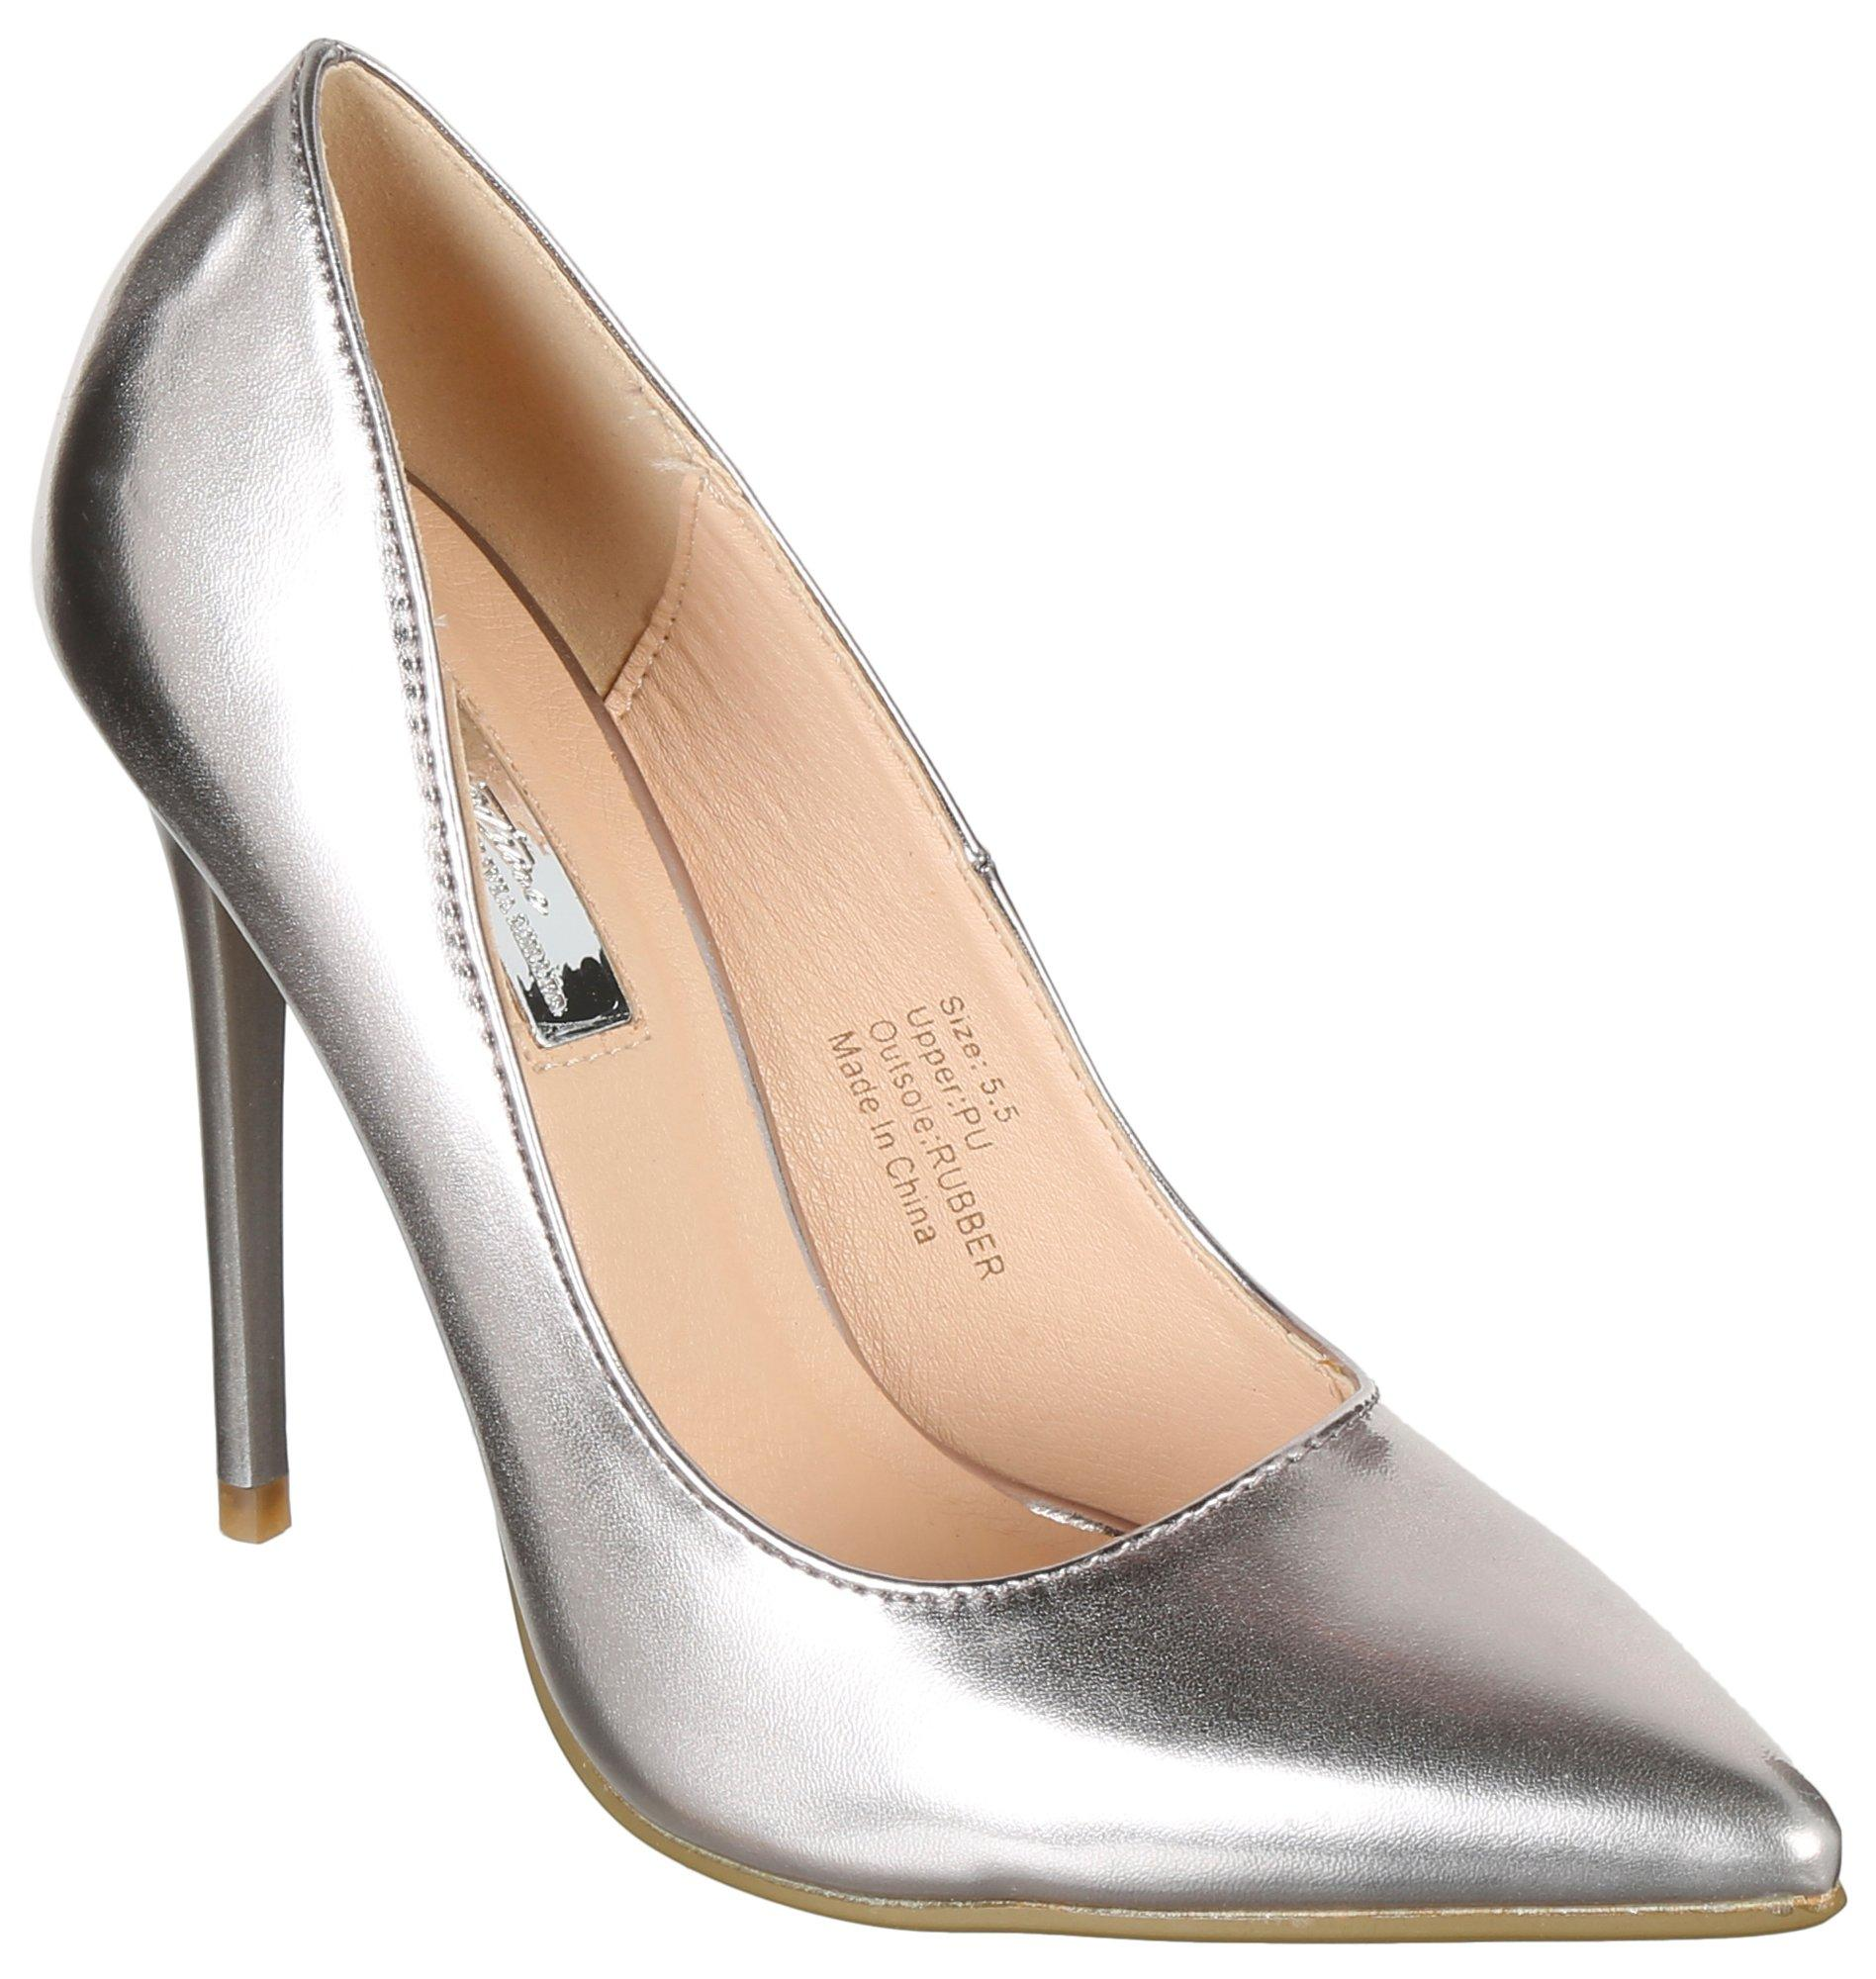 3f51751d3dc Olivia Miller. Metallic Pumps - Silver